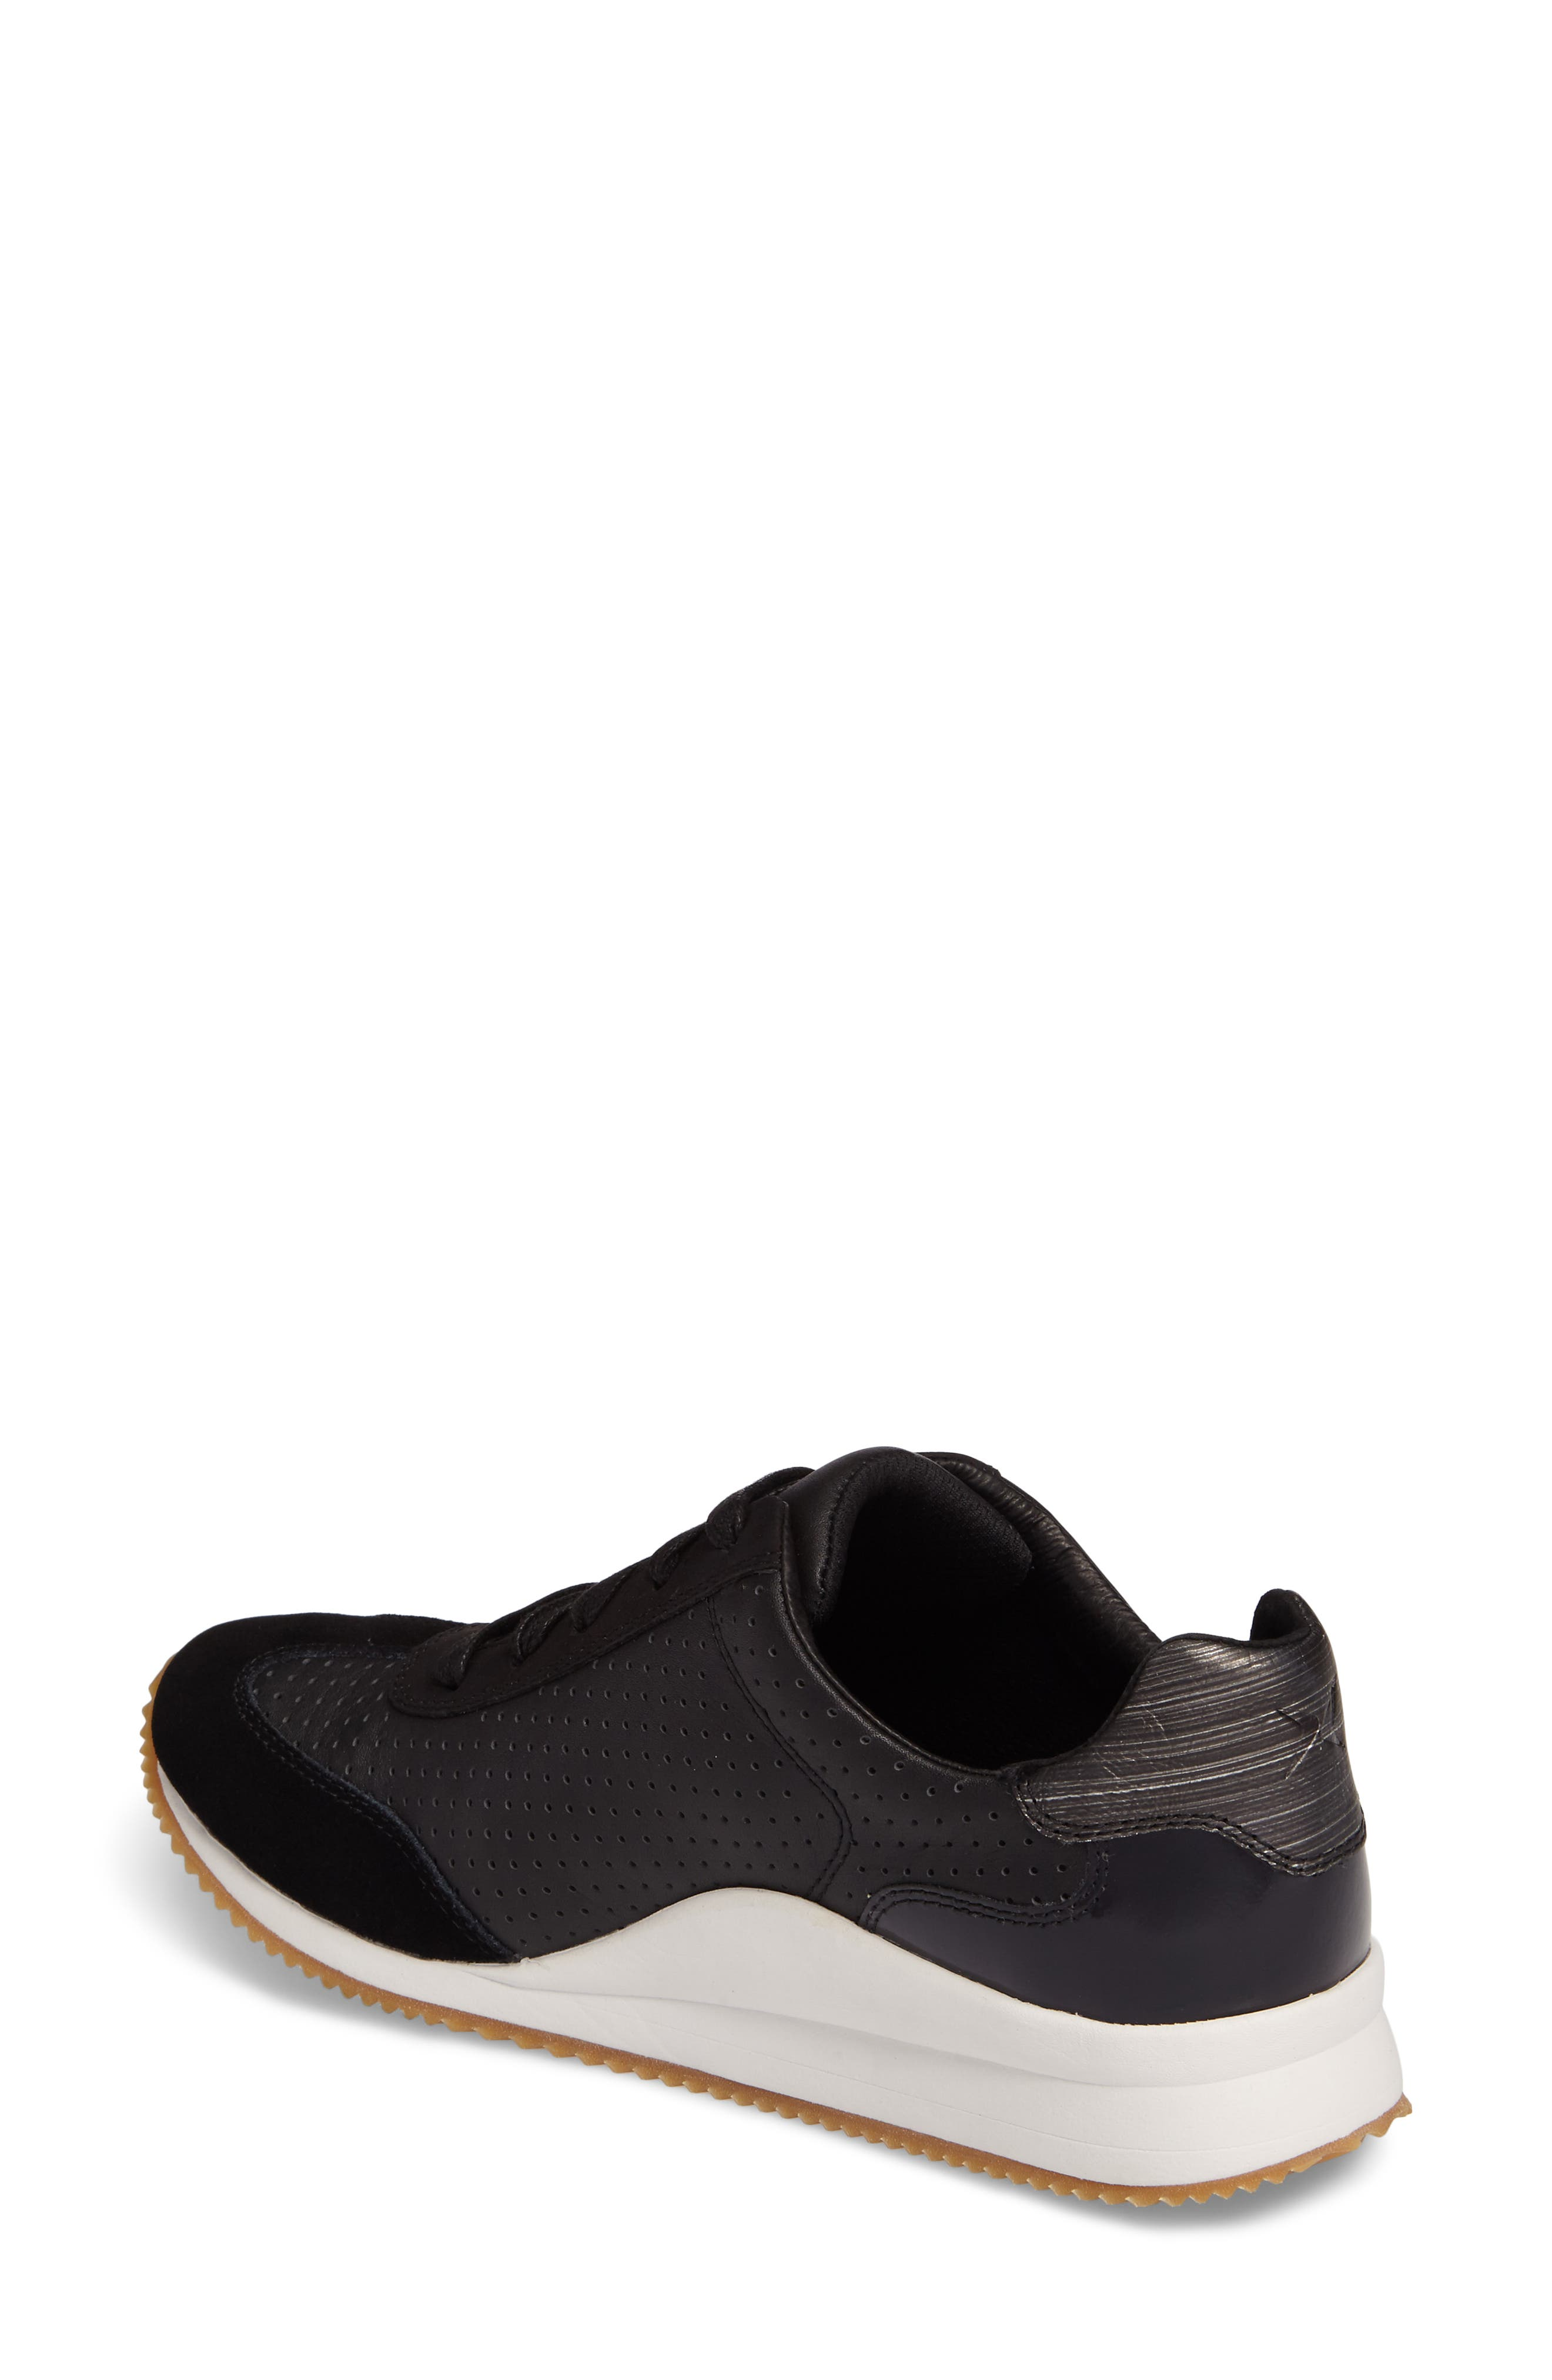 Nadia Sneaker,                             Alternate thumbnail 2, color,                             001